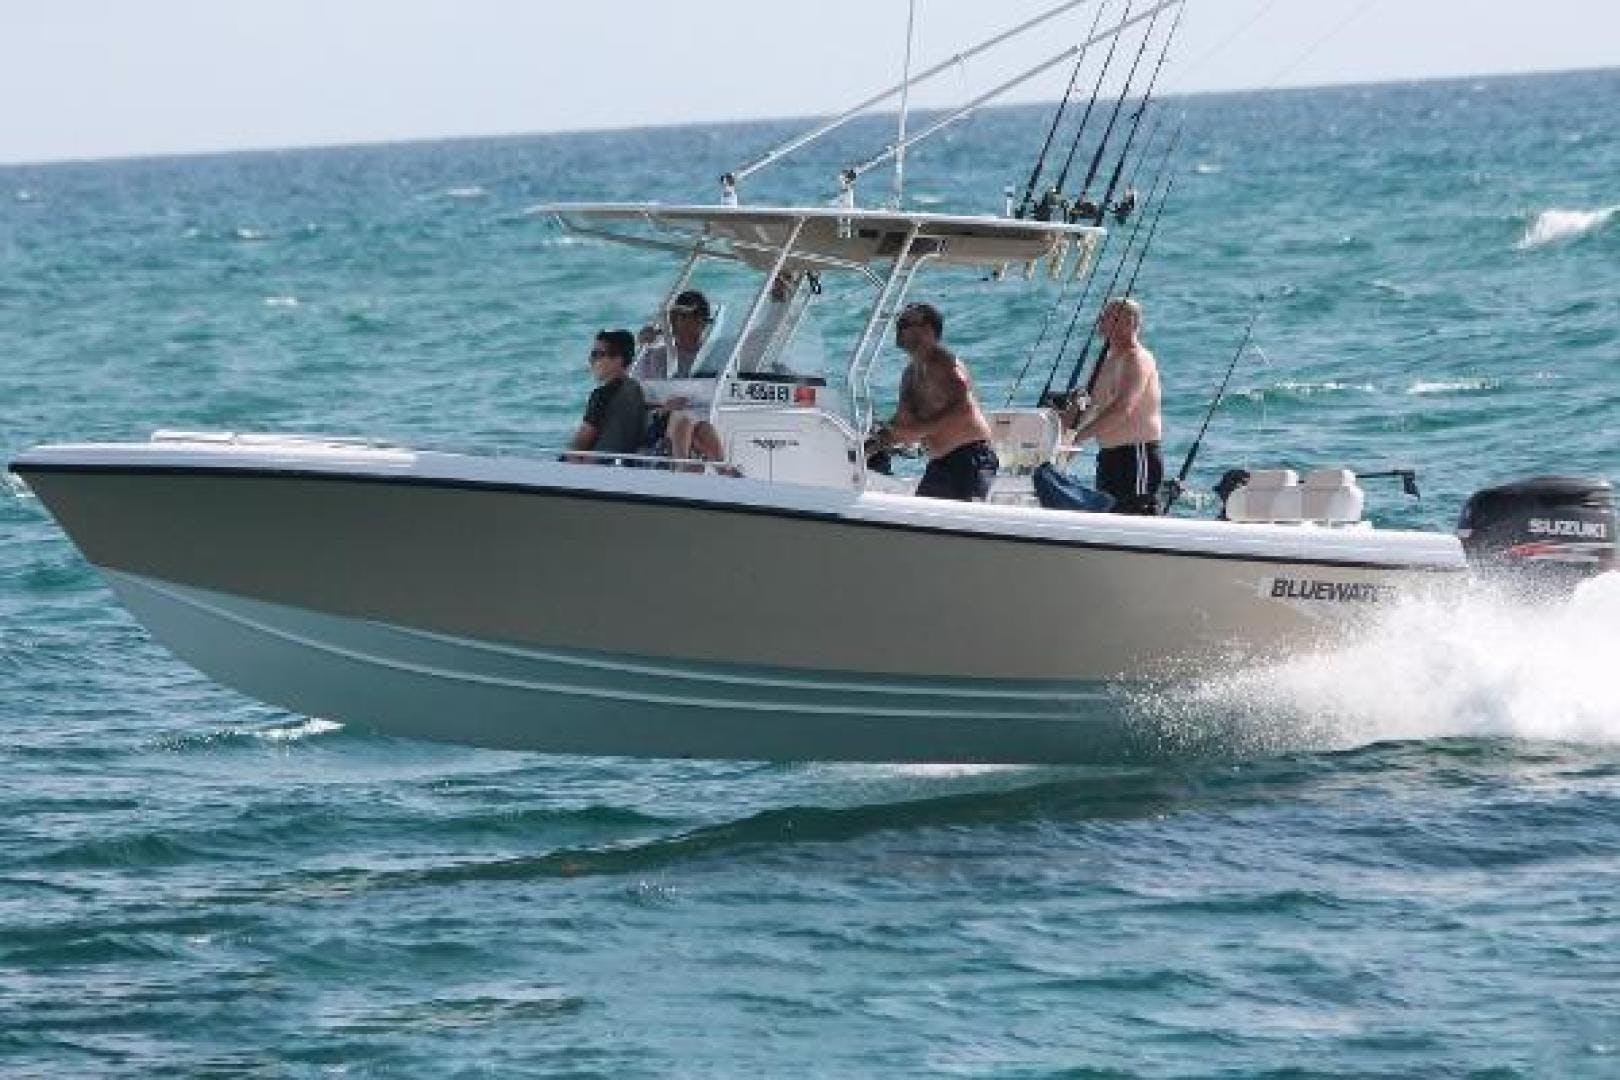 2021 Bluewater Sportfishing 24' 2550 Bluewater Sportfishing 2550   Picture 2 of 13